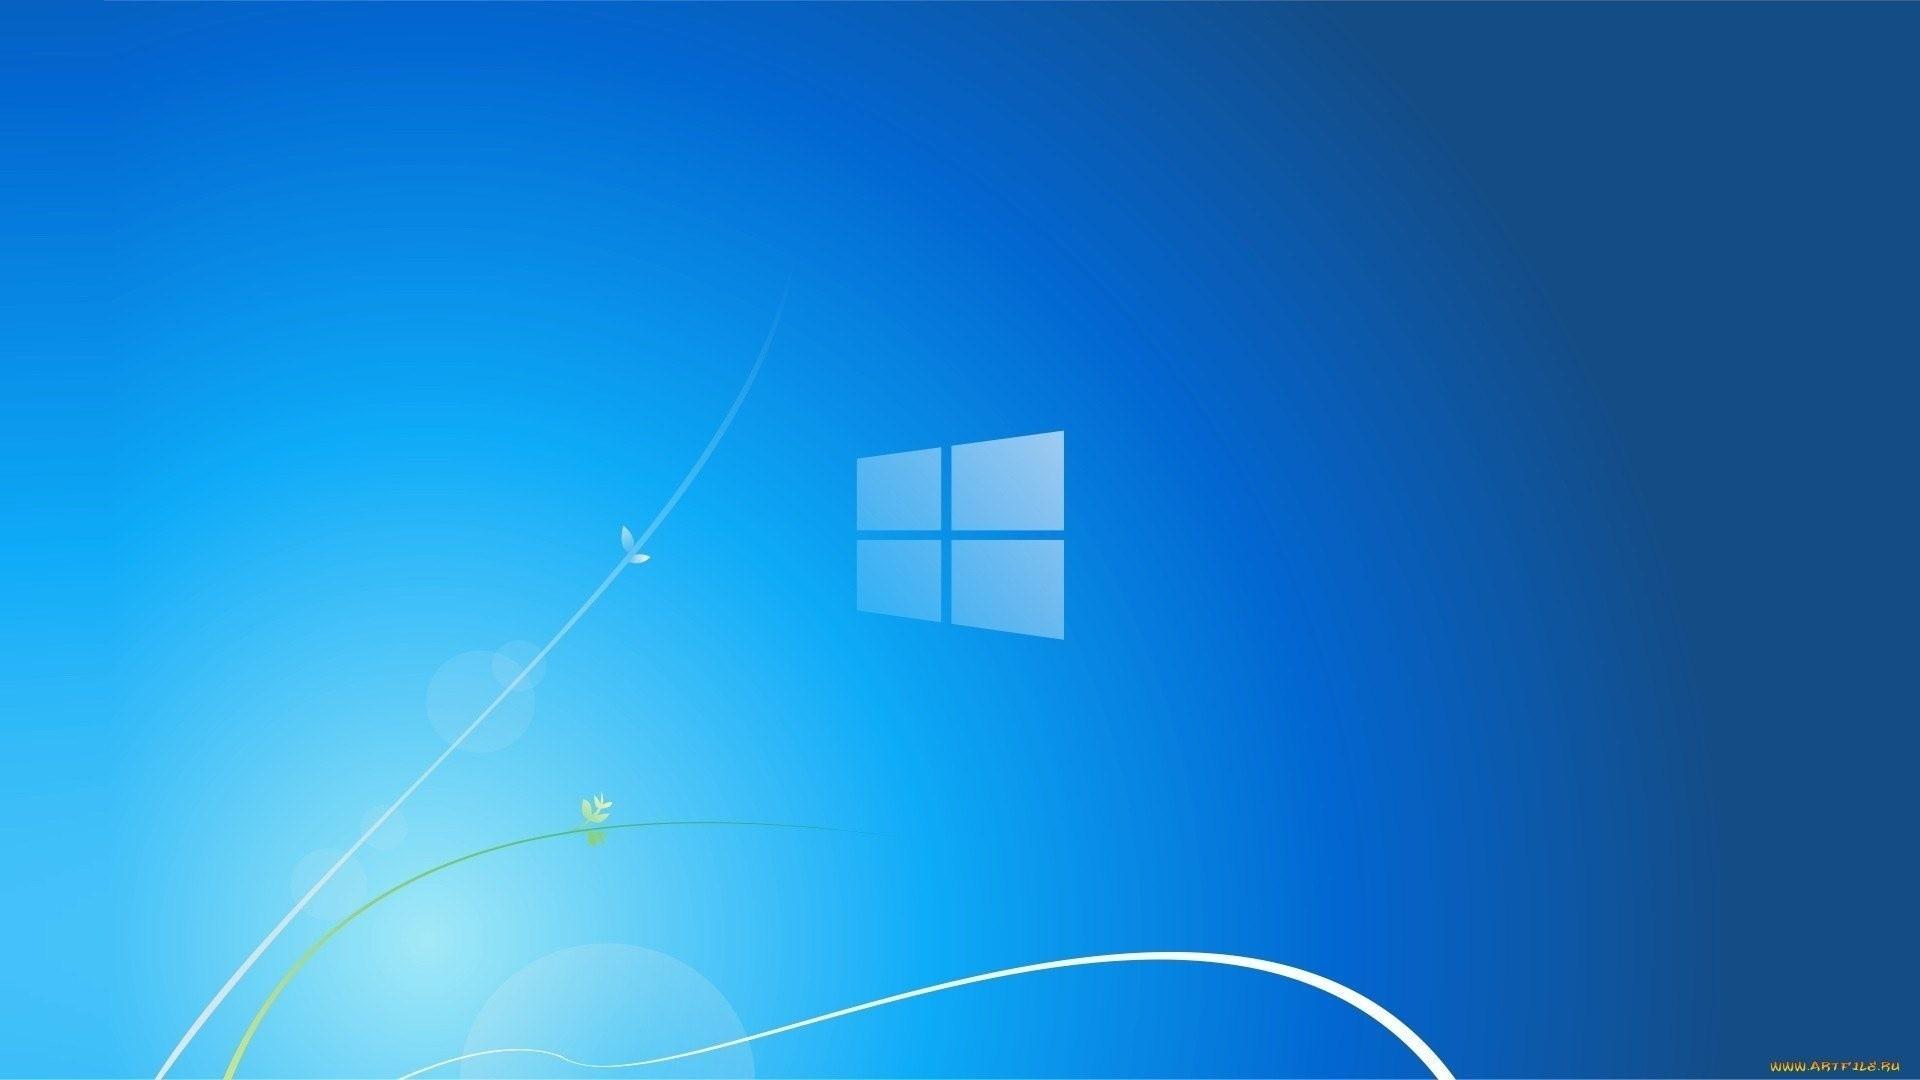 Best Windows 8 Wallpaper 72 Images